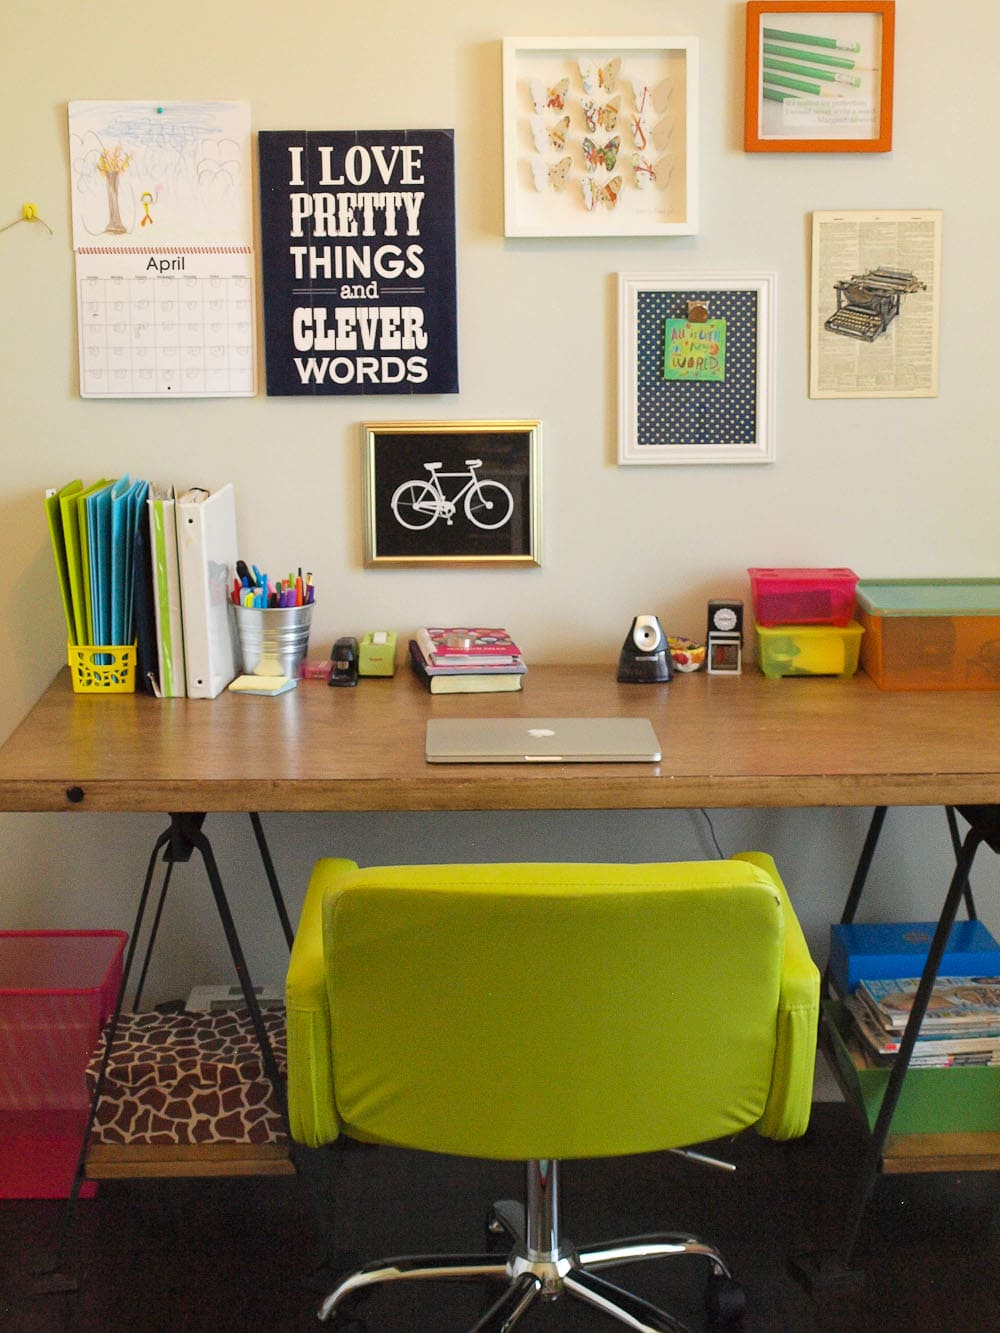 Organized work desk the hippest pics - Organized work desk ...